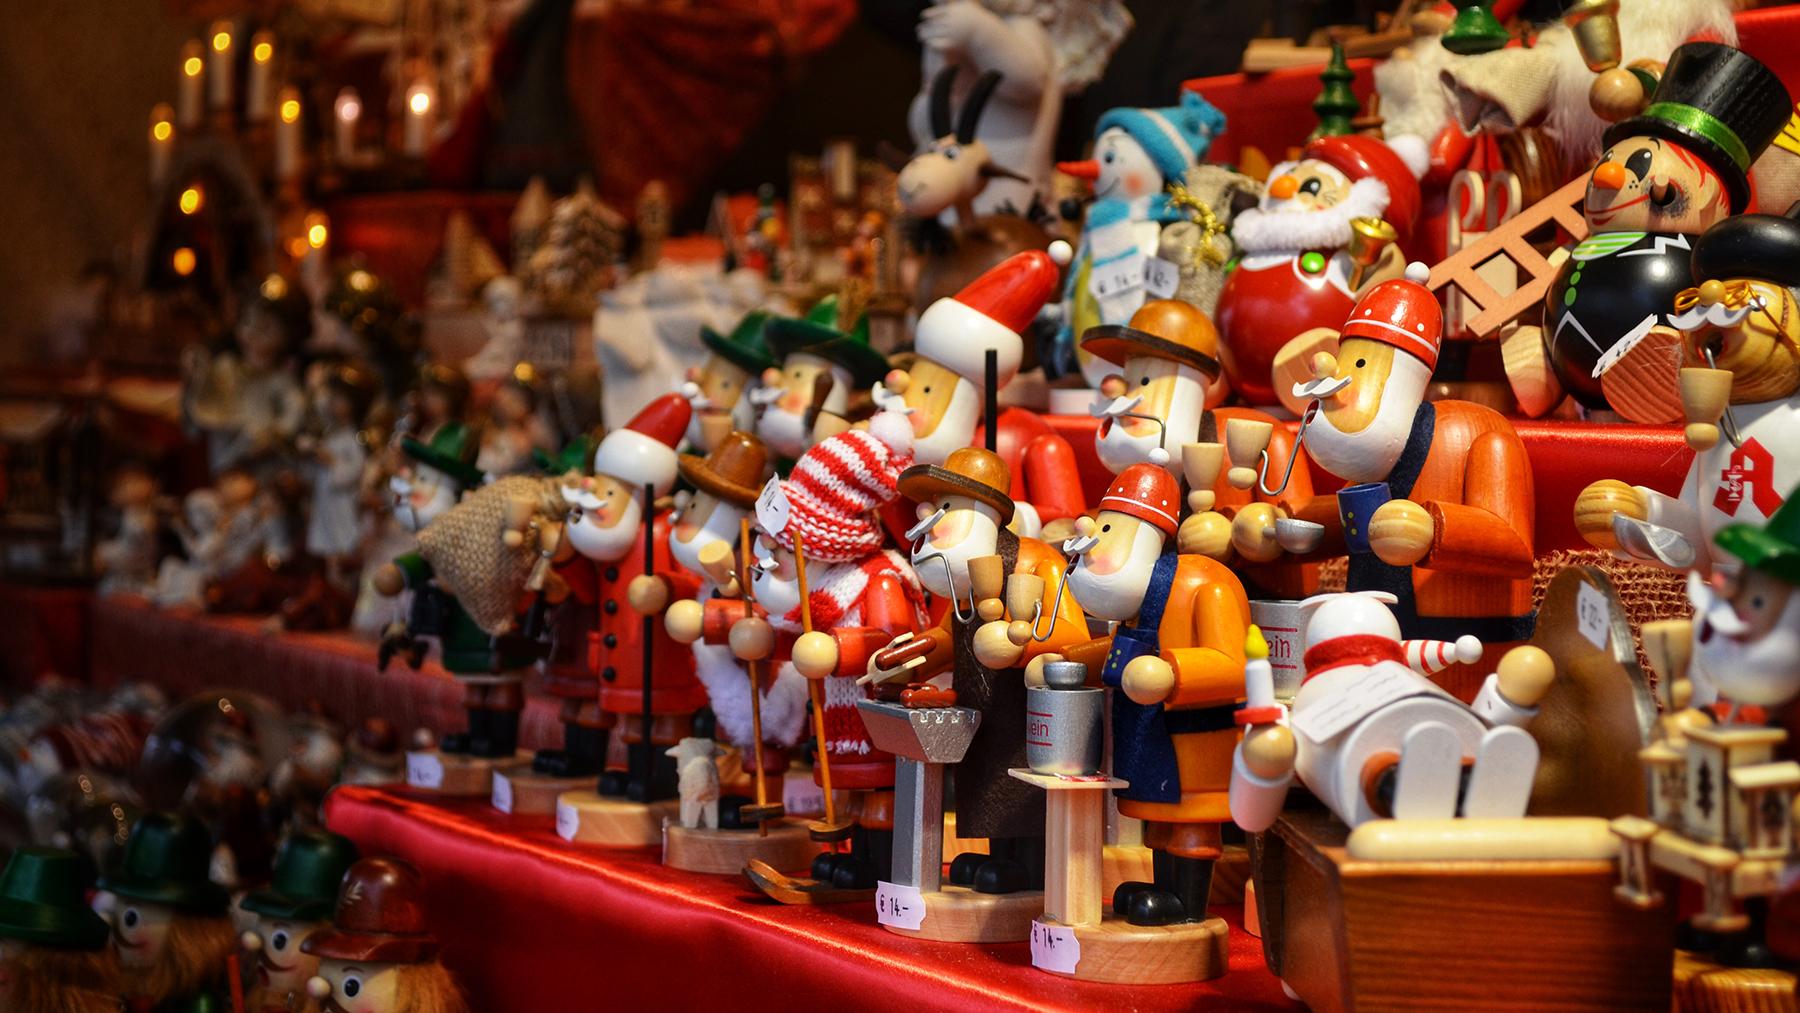 mercadillo navideño, christkindlmarkt munich